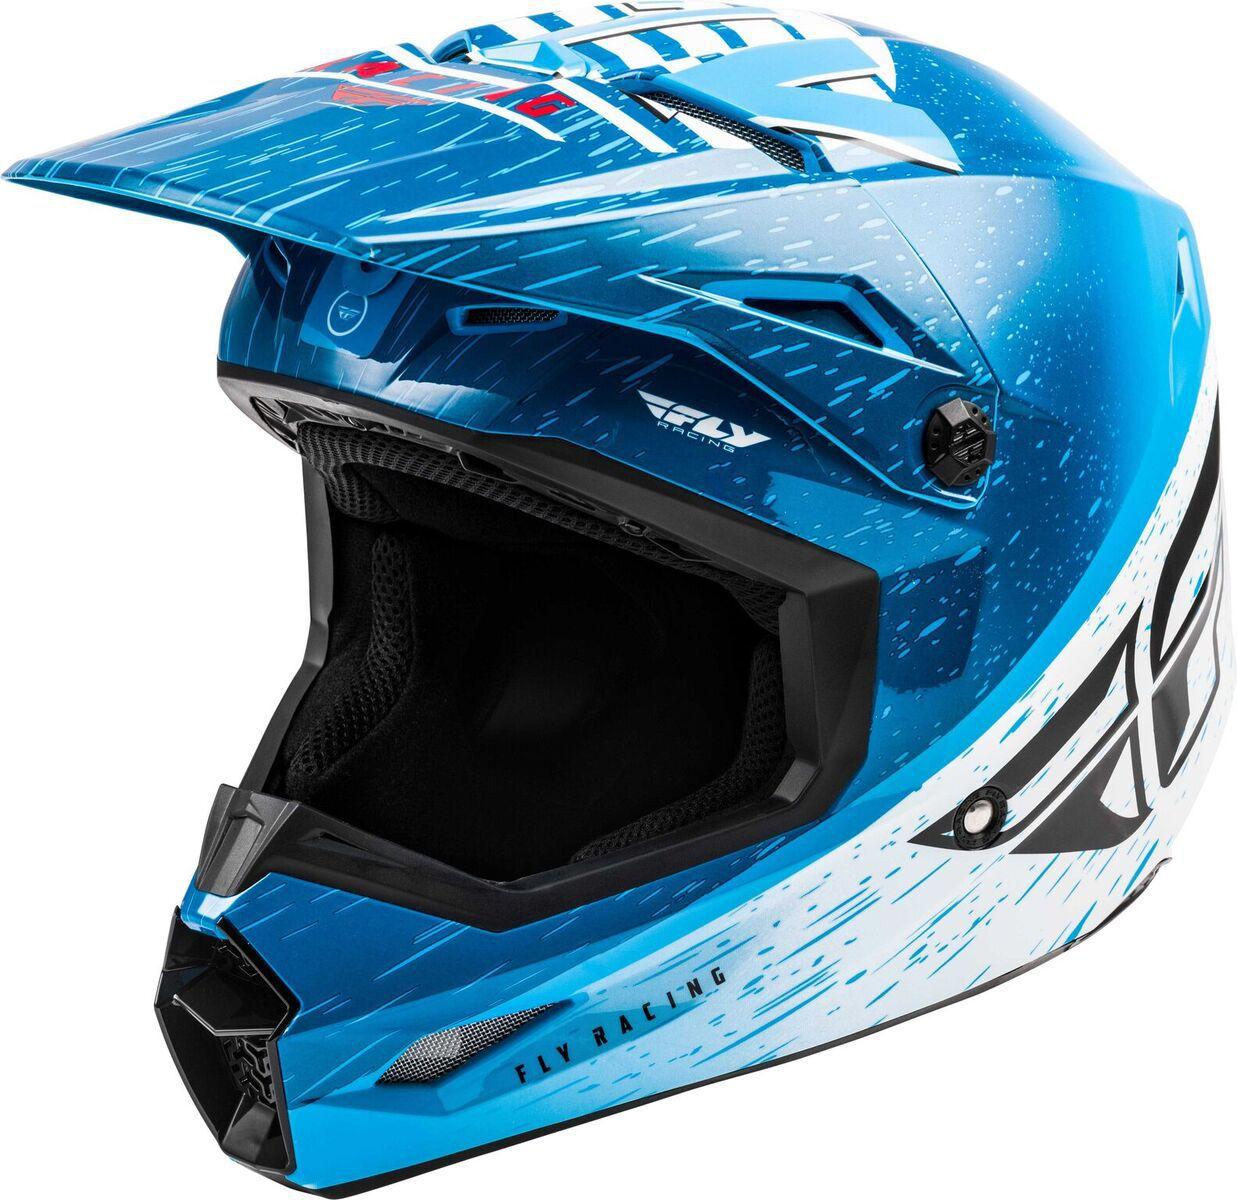 Capacete FLY Kinetic K120 - Azul